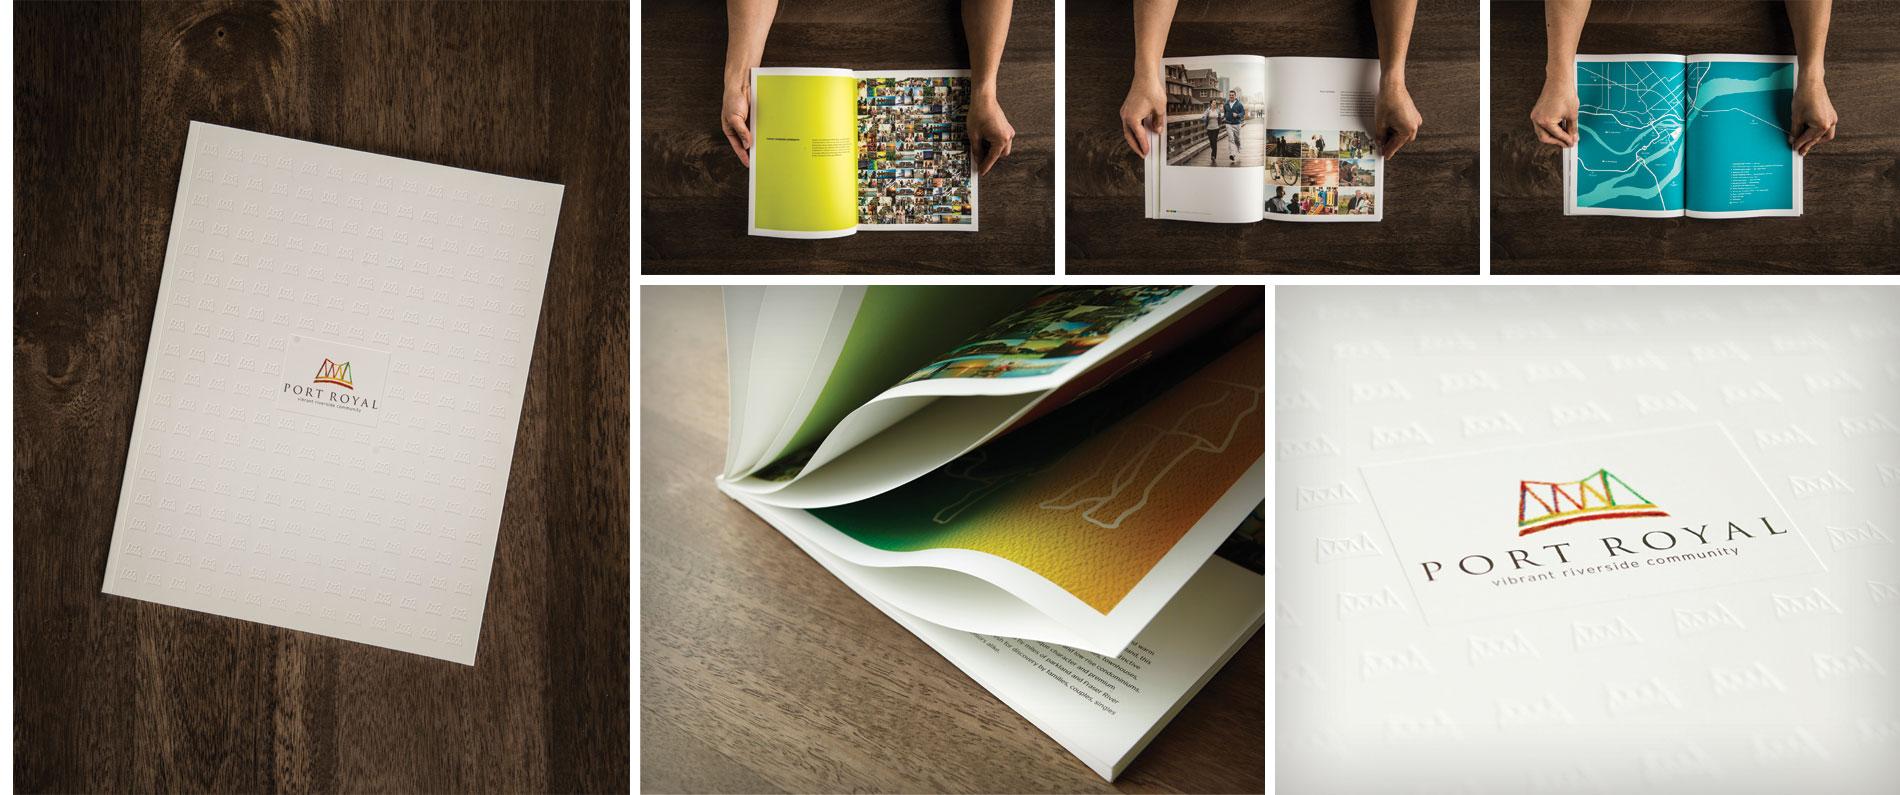 A custom brochure for Port Royal